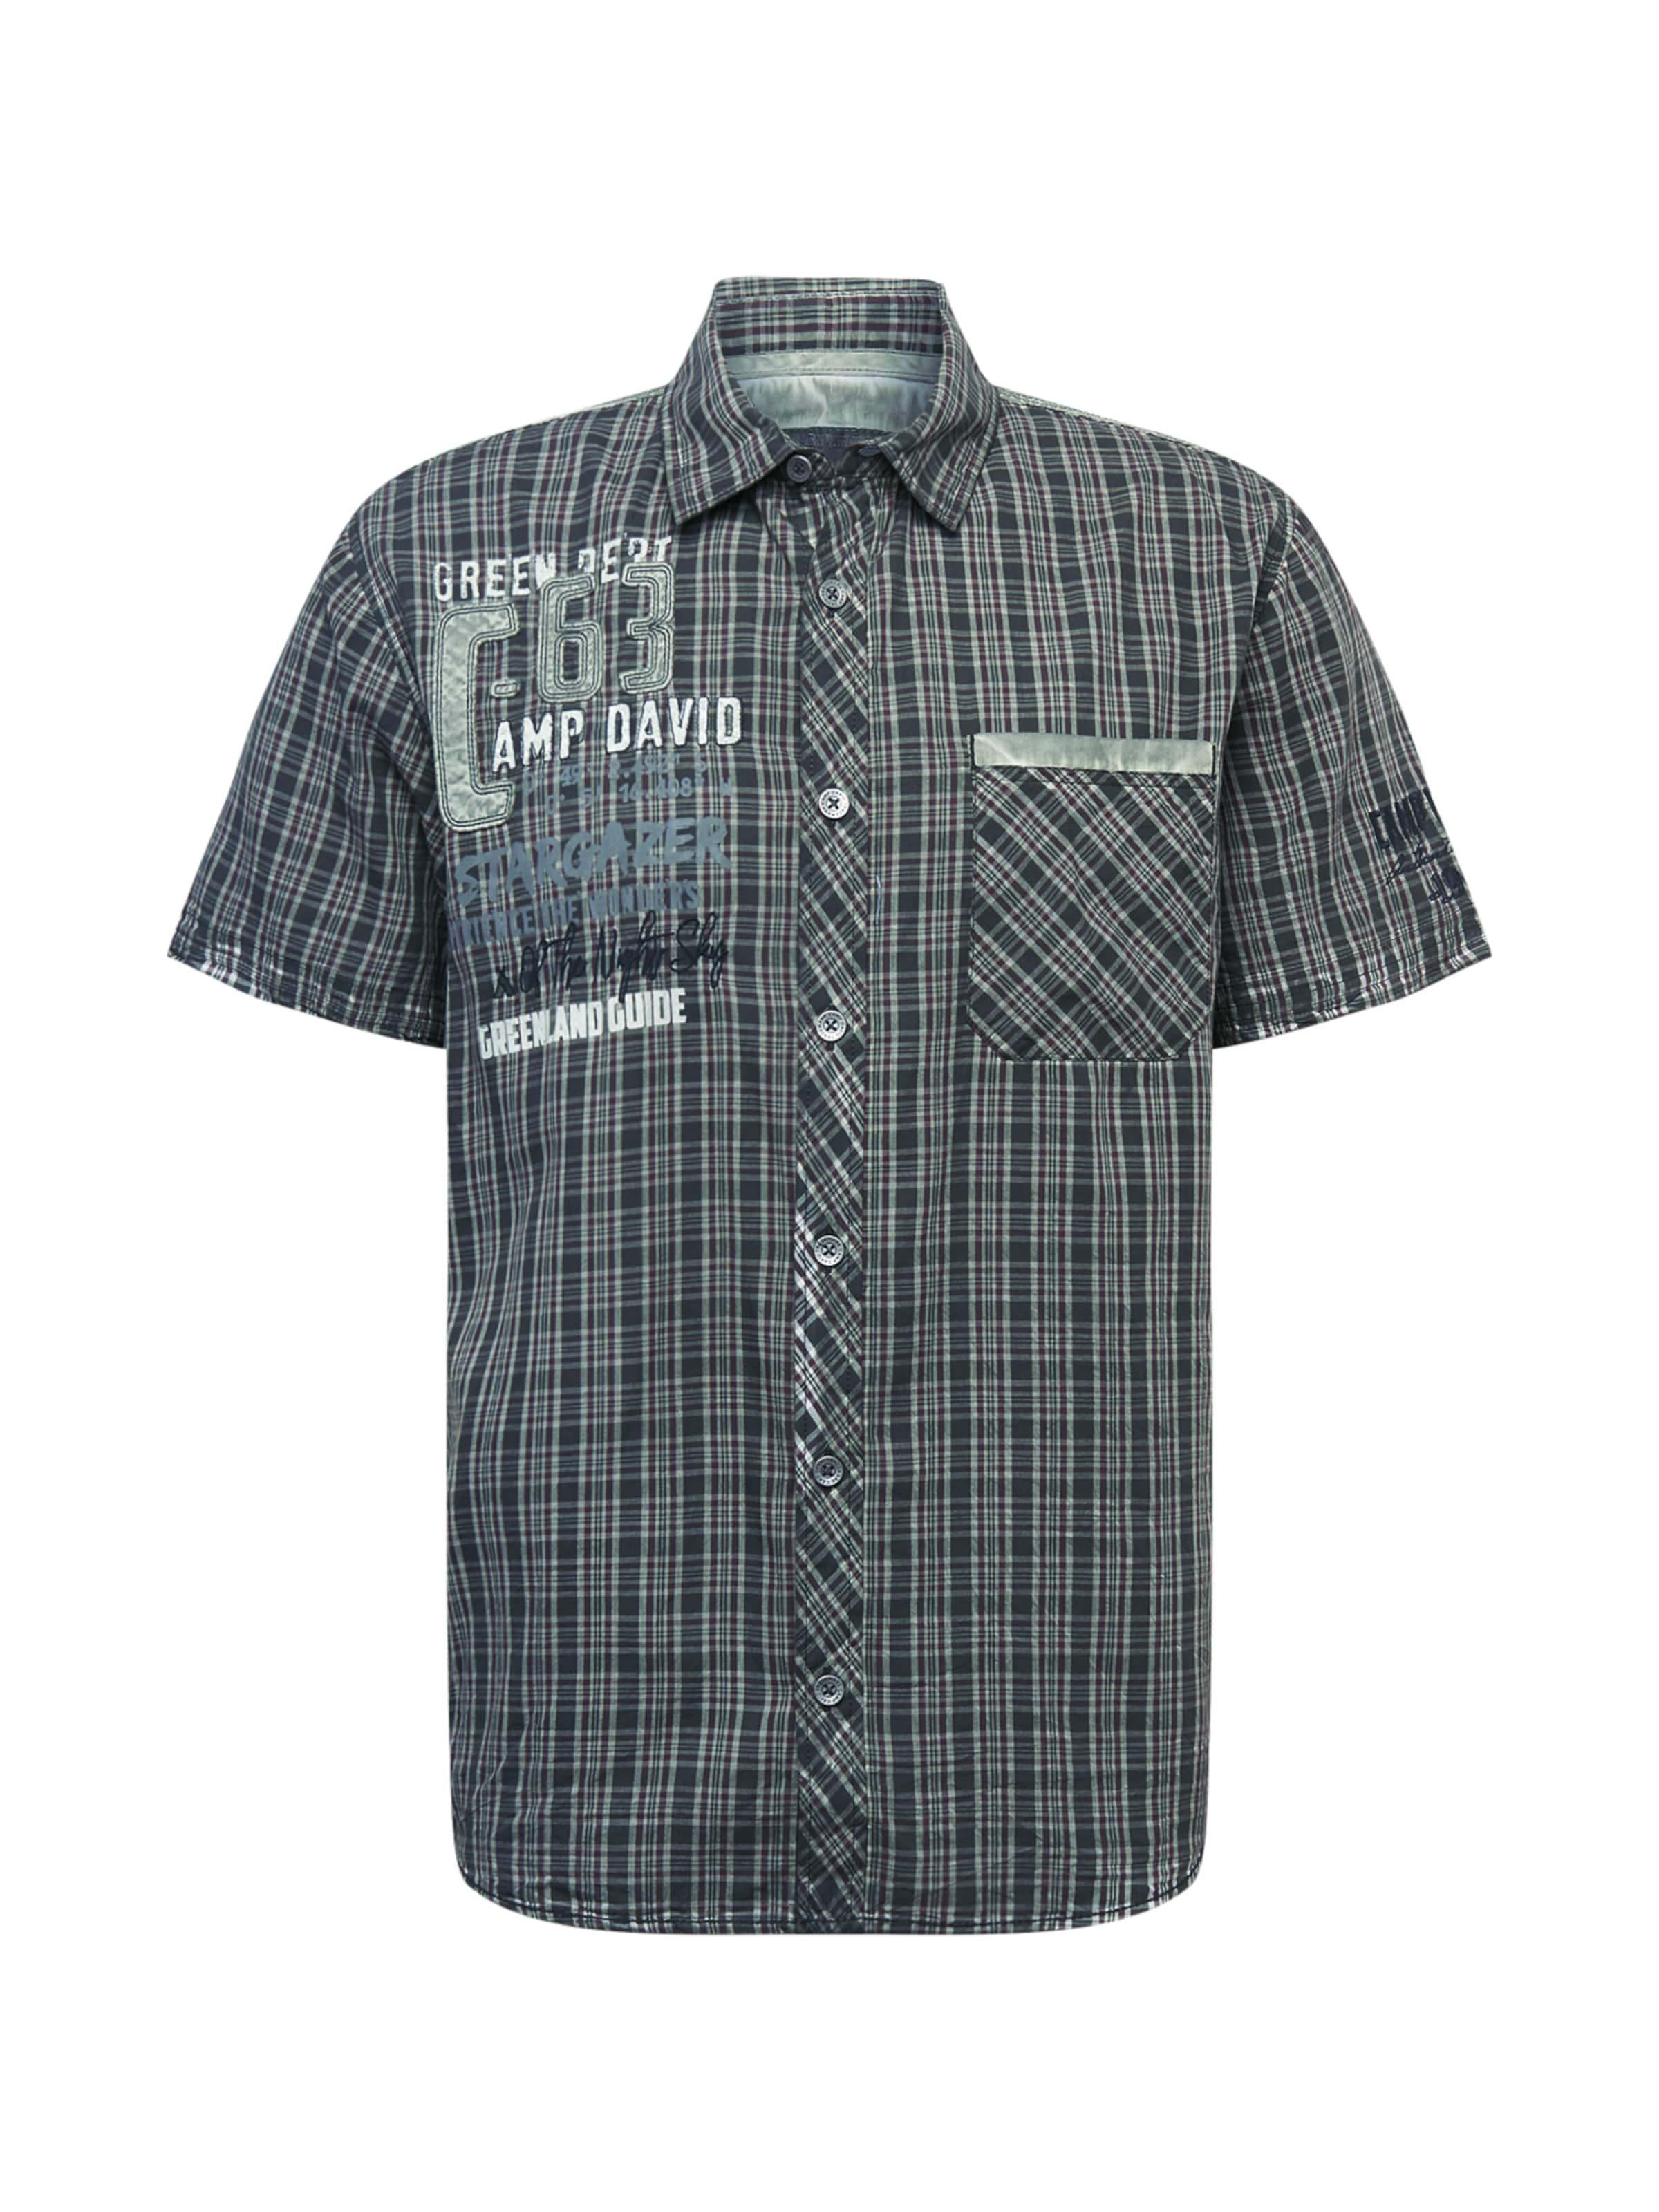 CAMP DAVID Skjorta i pastellgrön / mörkgrön